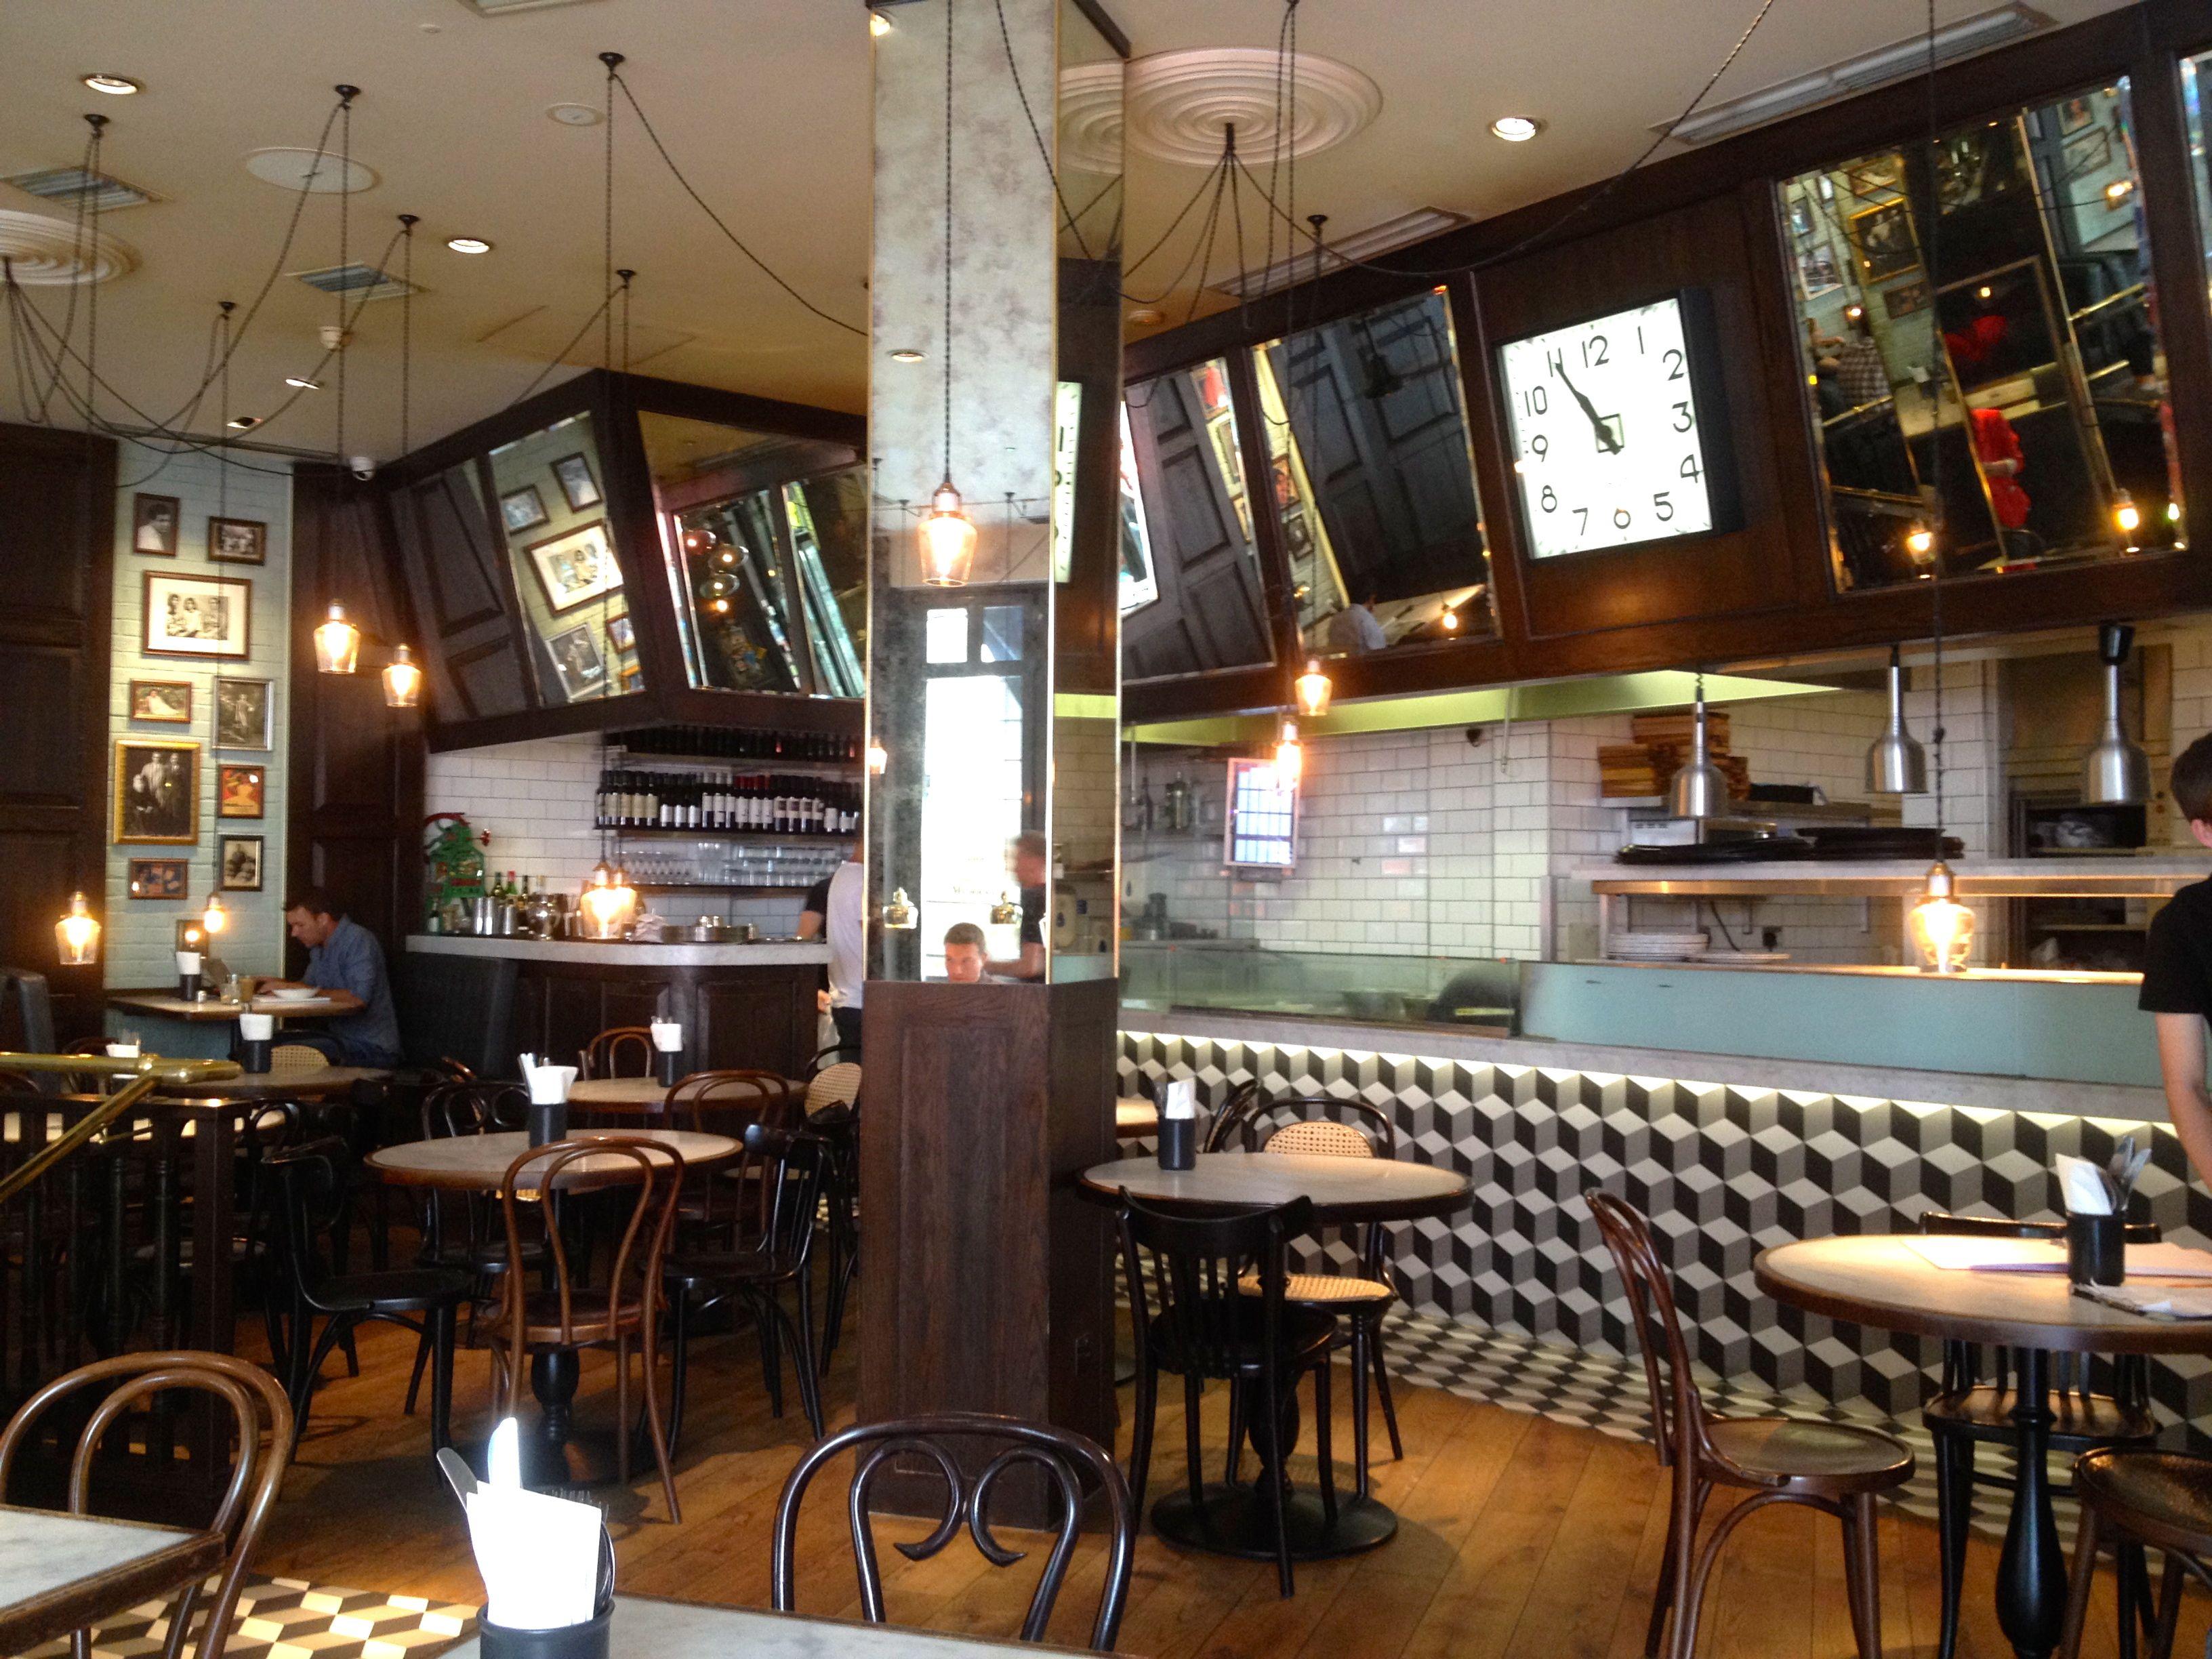 chic shoreditch style restaurant interior - Google Search